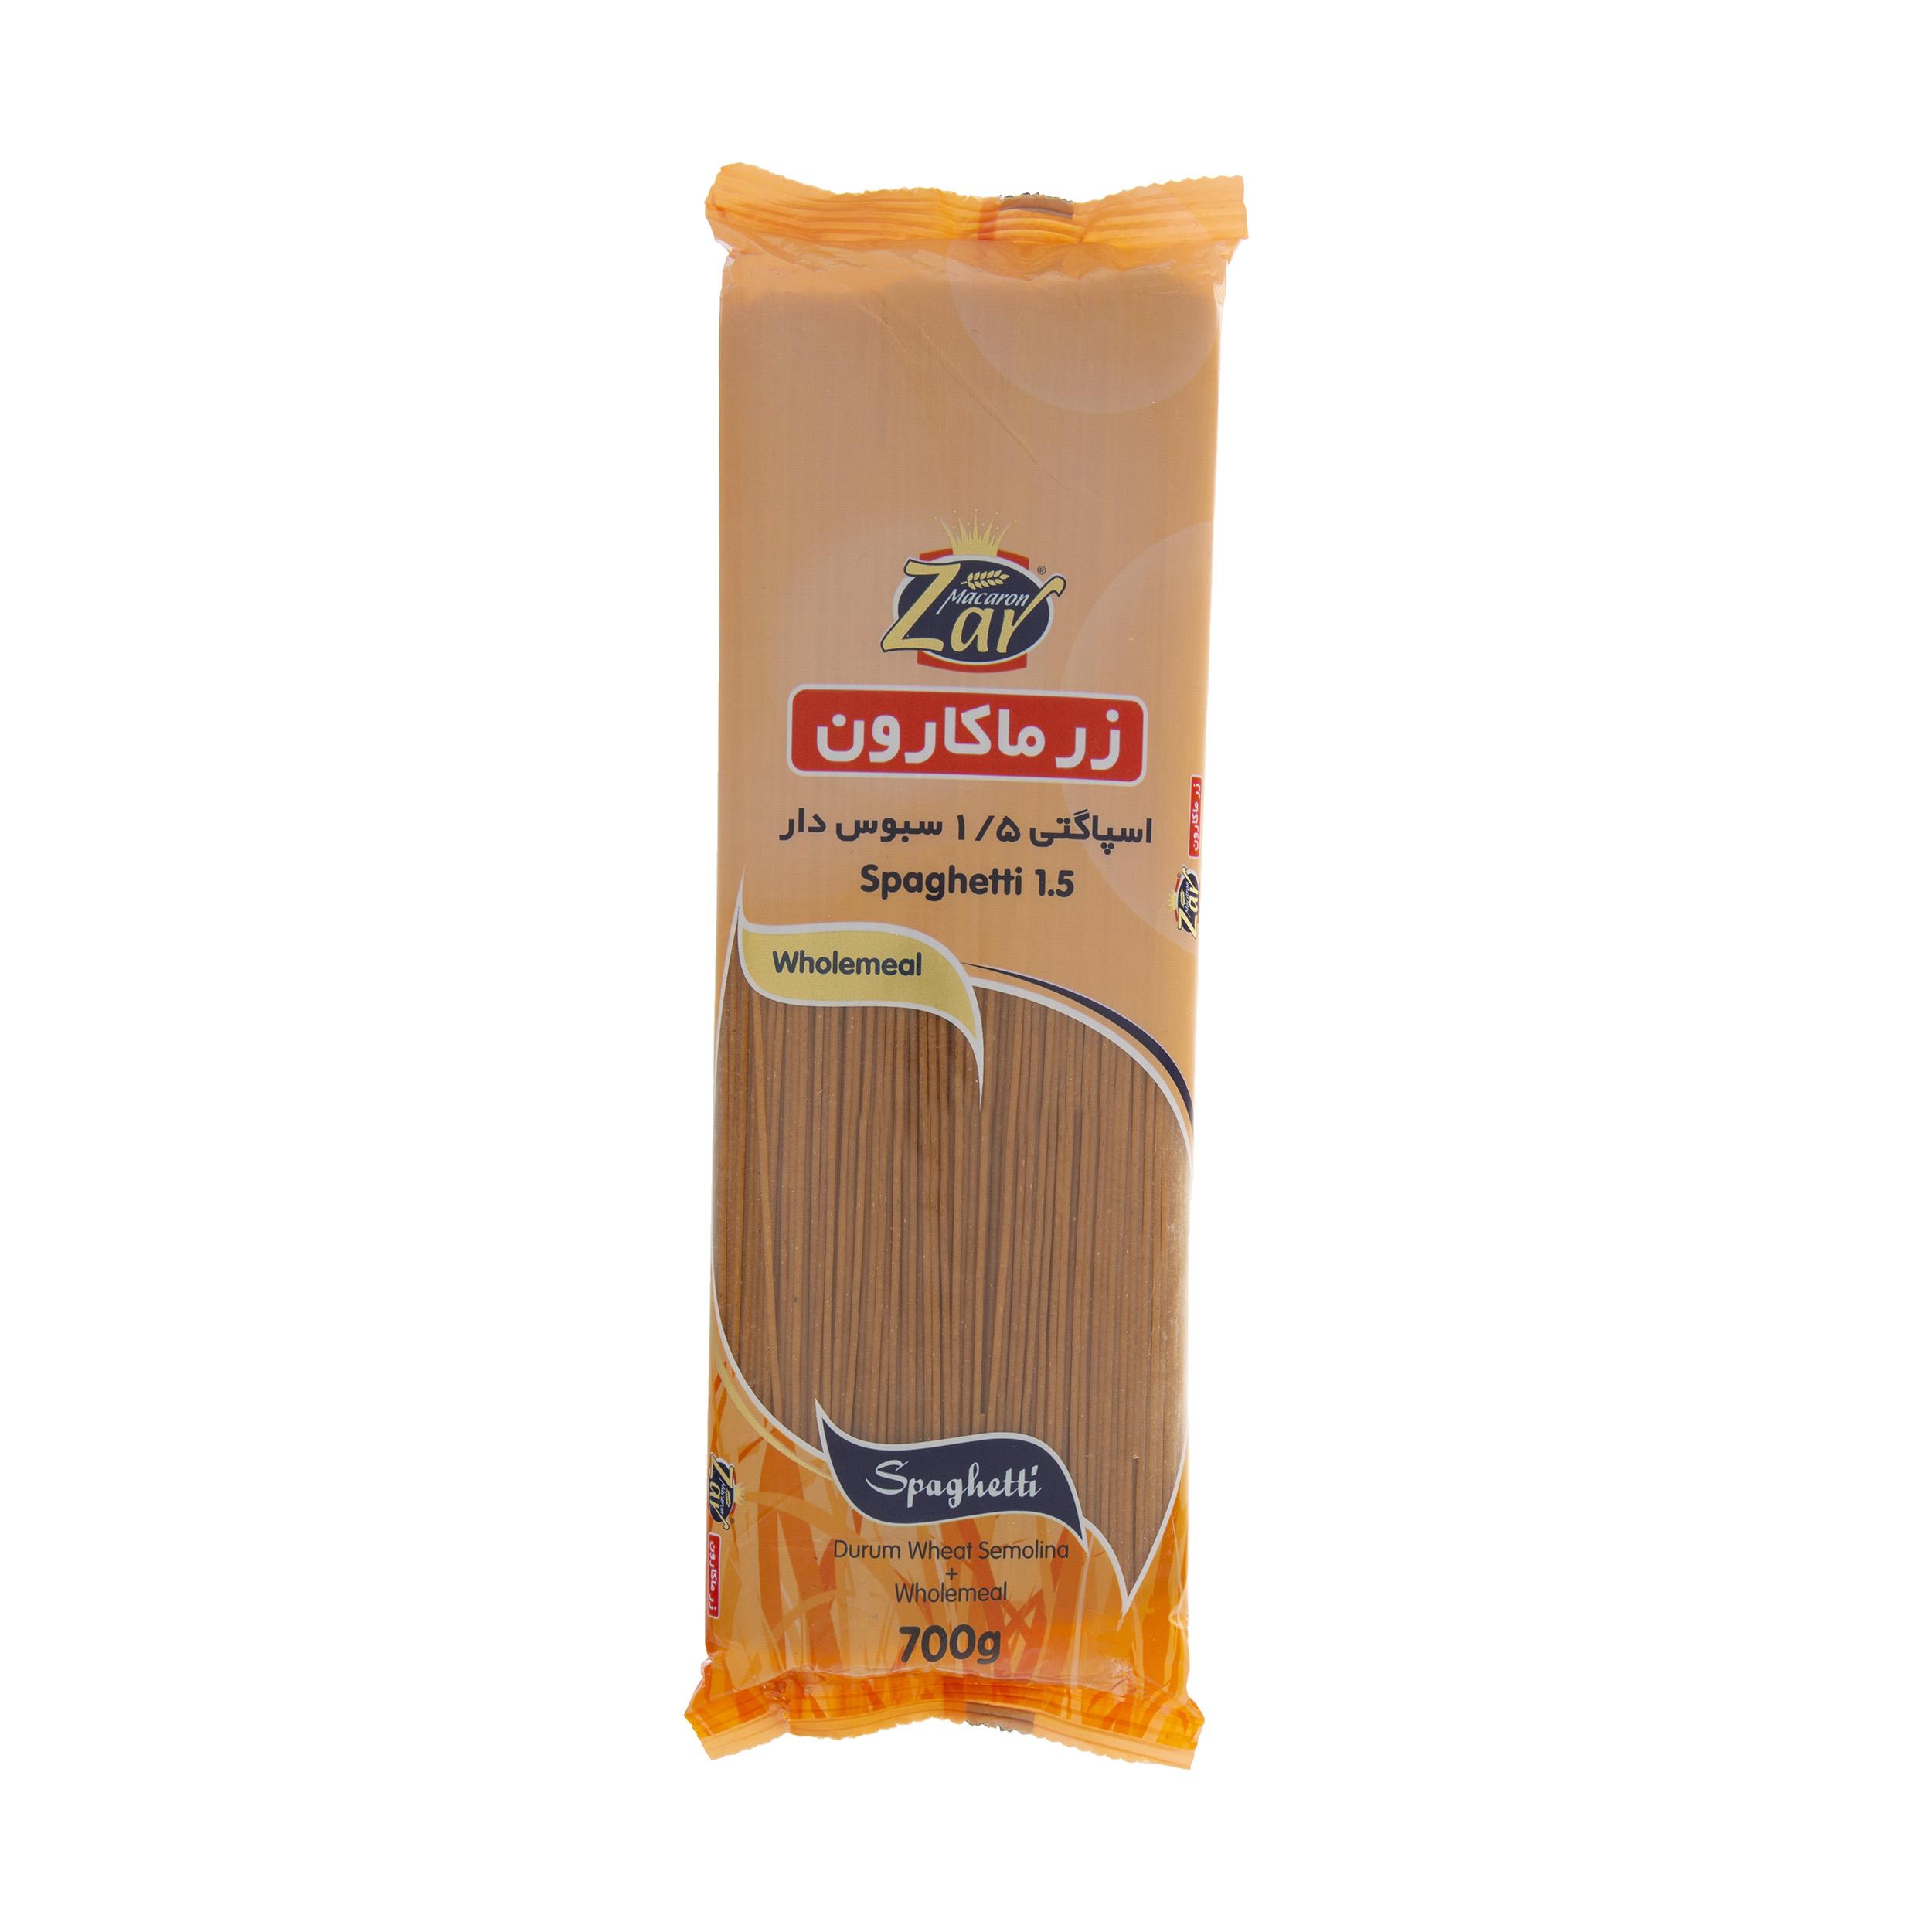 اسپاگتی قطر 1.5 سبوس دار زر ماکارون وزن 700 گرم